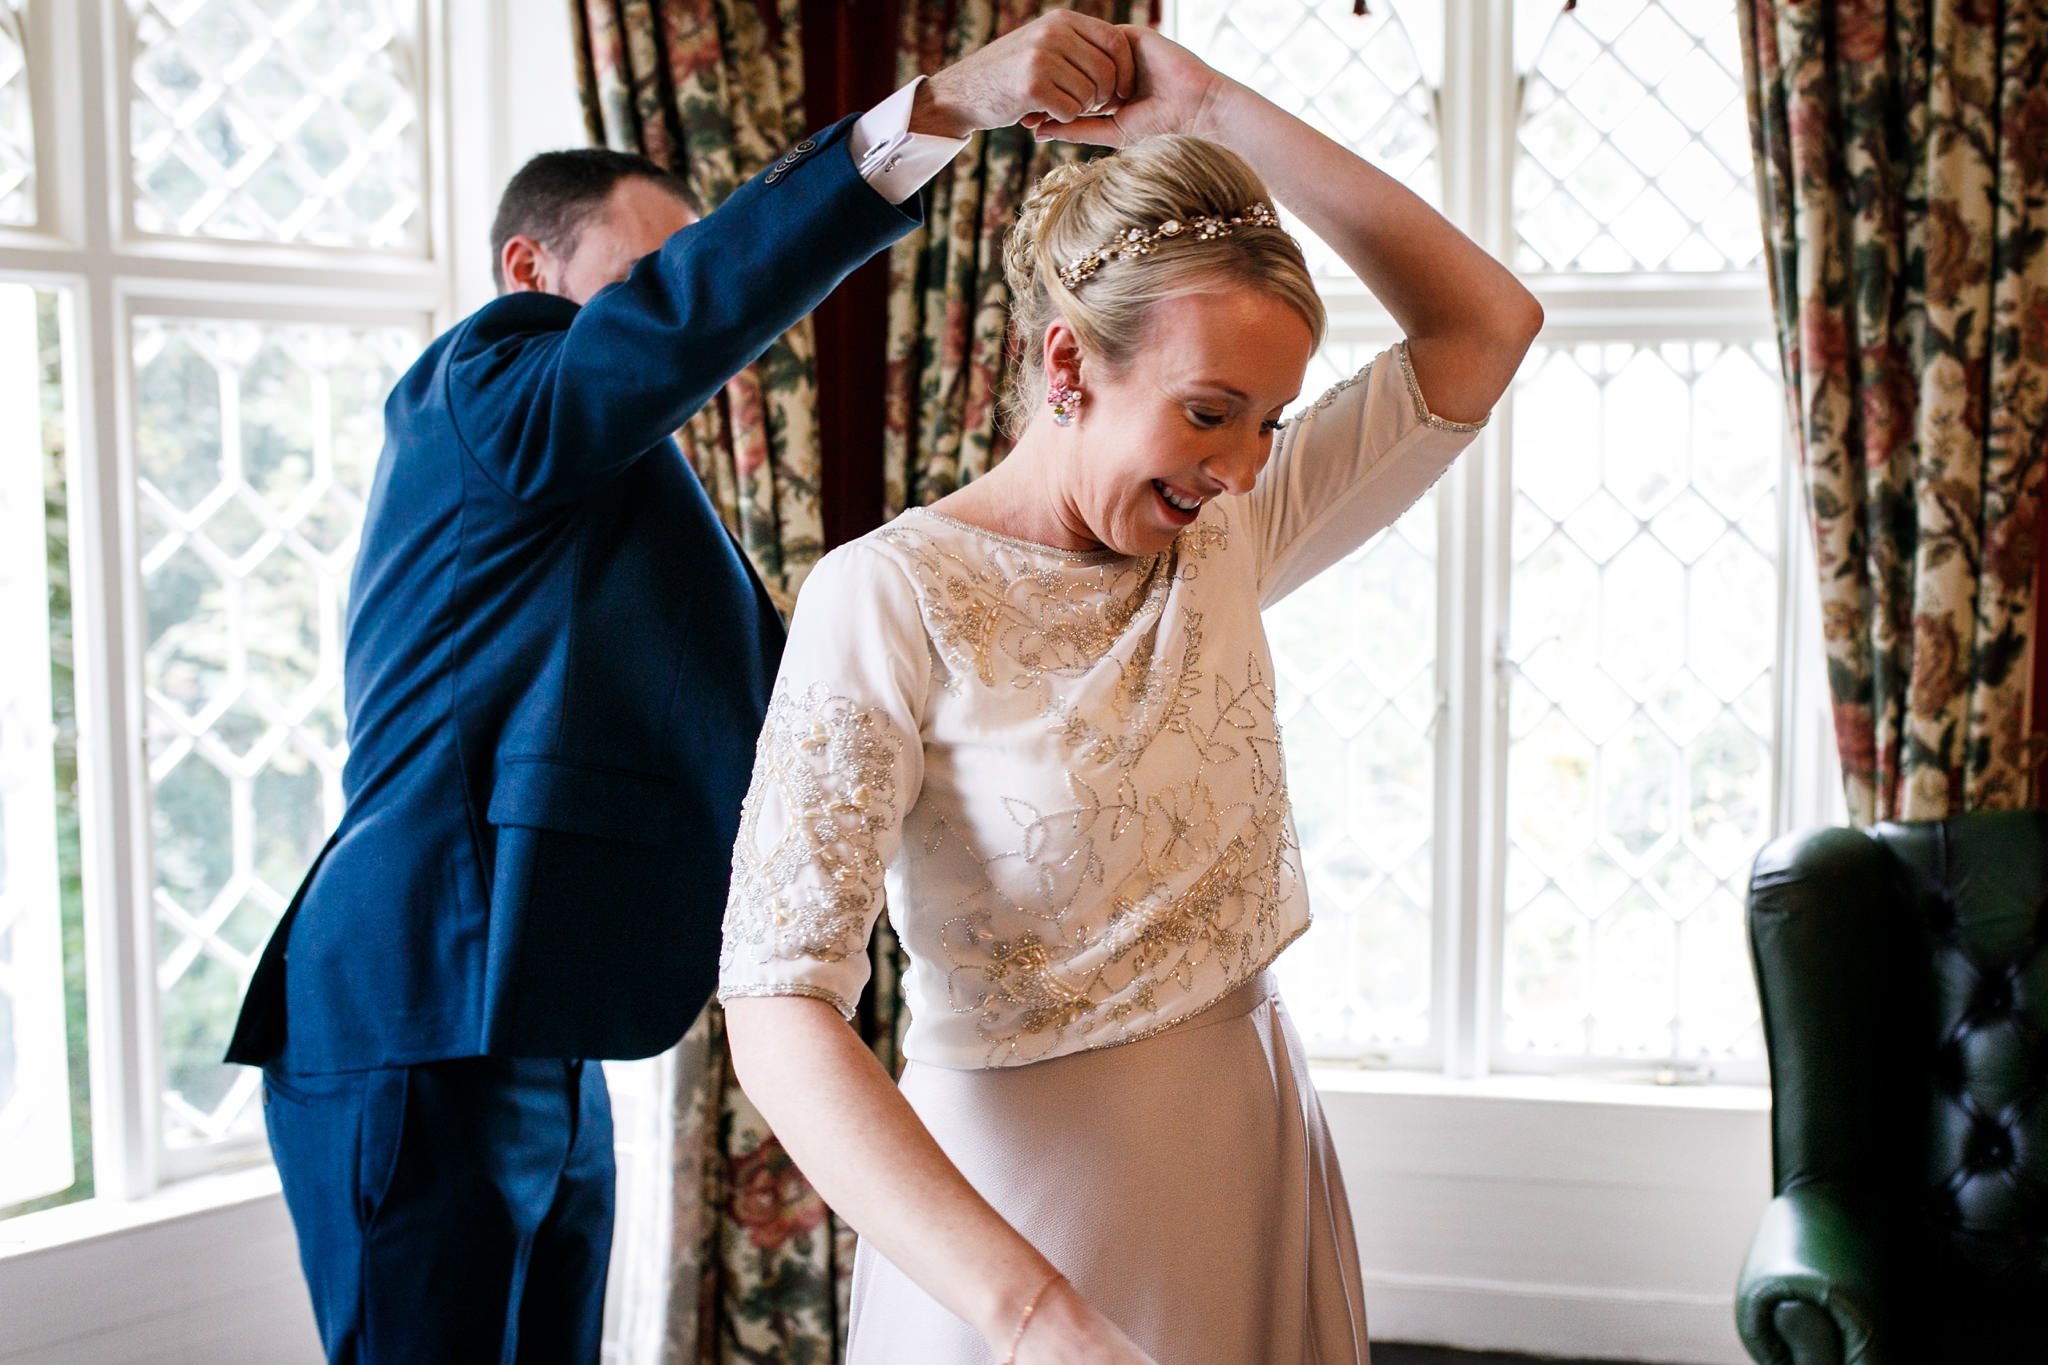 Elisha-Clarke-Photography-Dublin-City-Wedding_0060.jpg